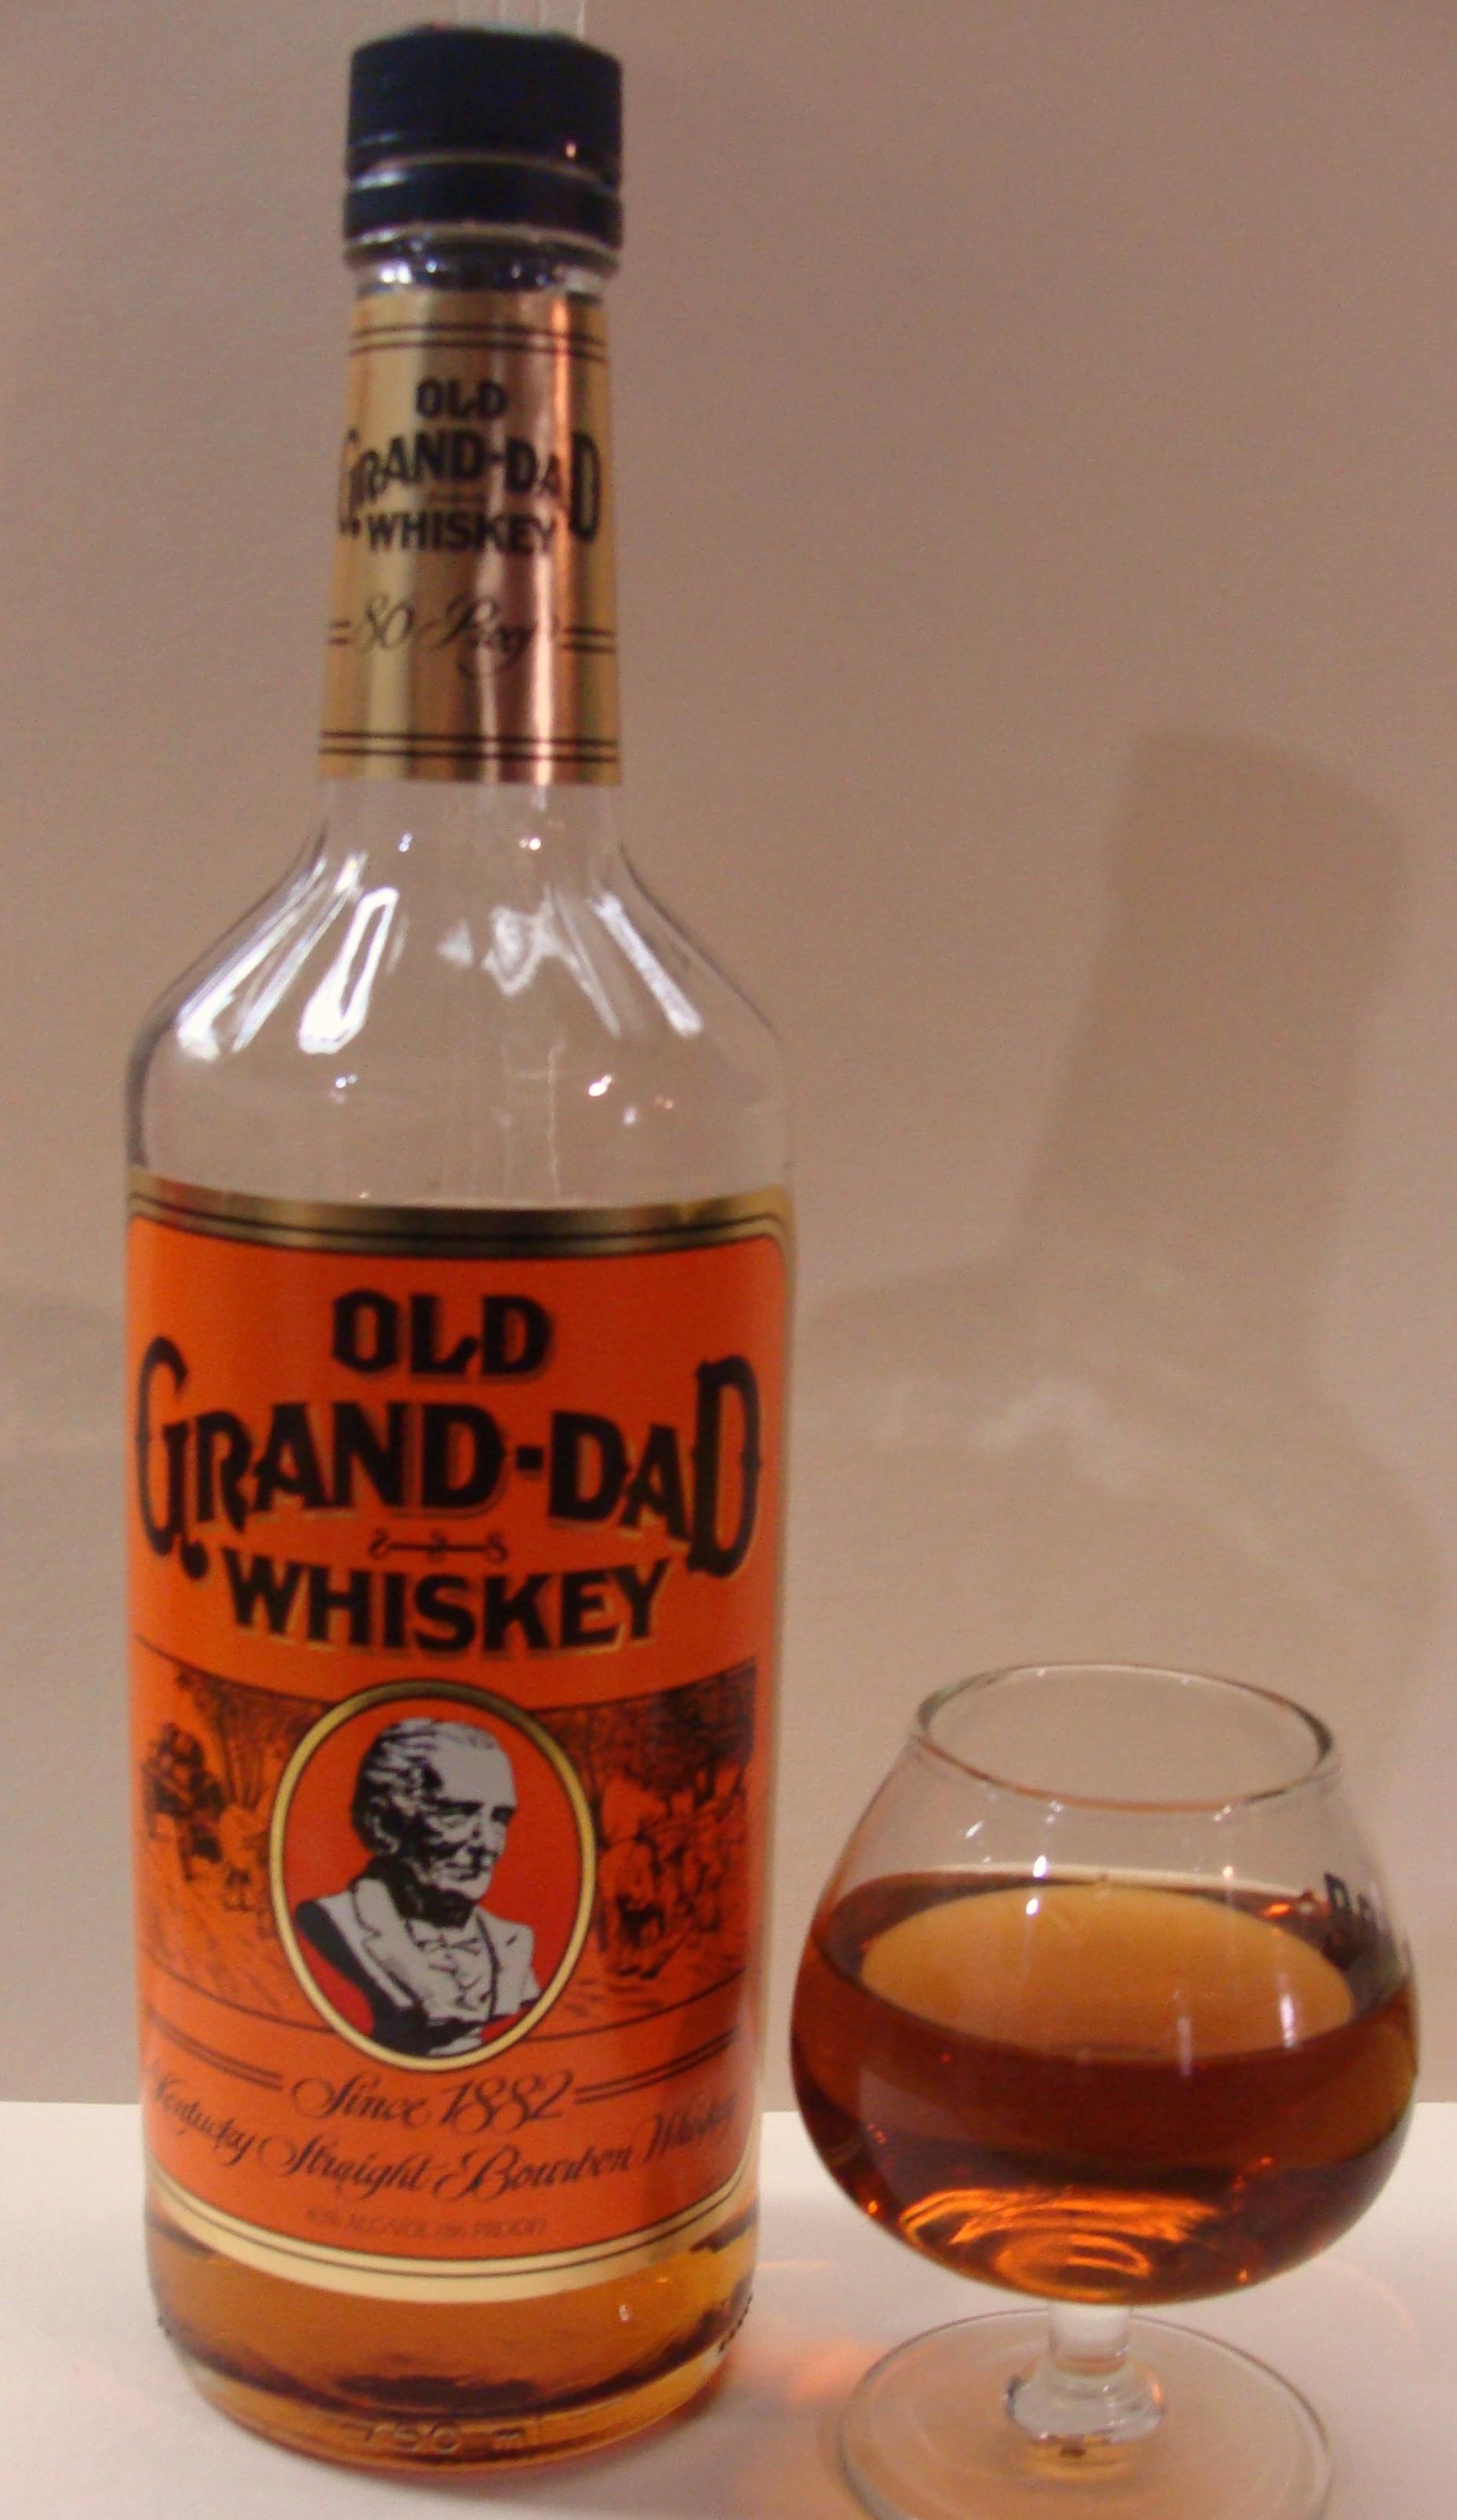 Granddad Whiskey Brands Whiskey Whisky Bottle